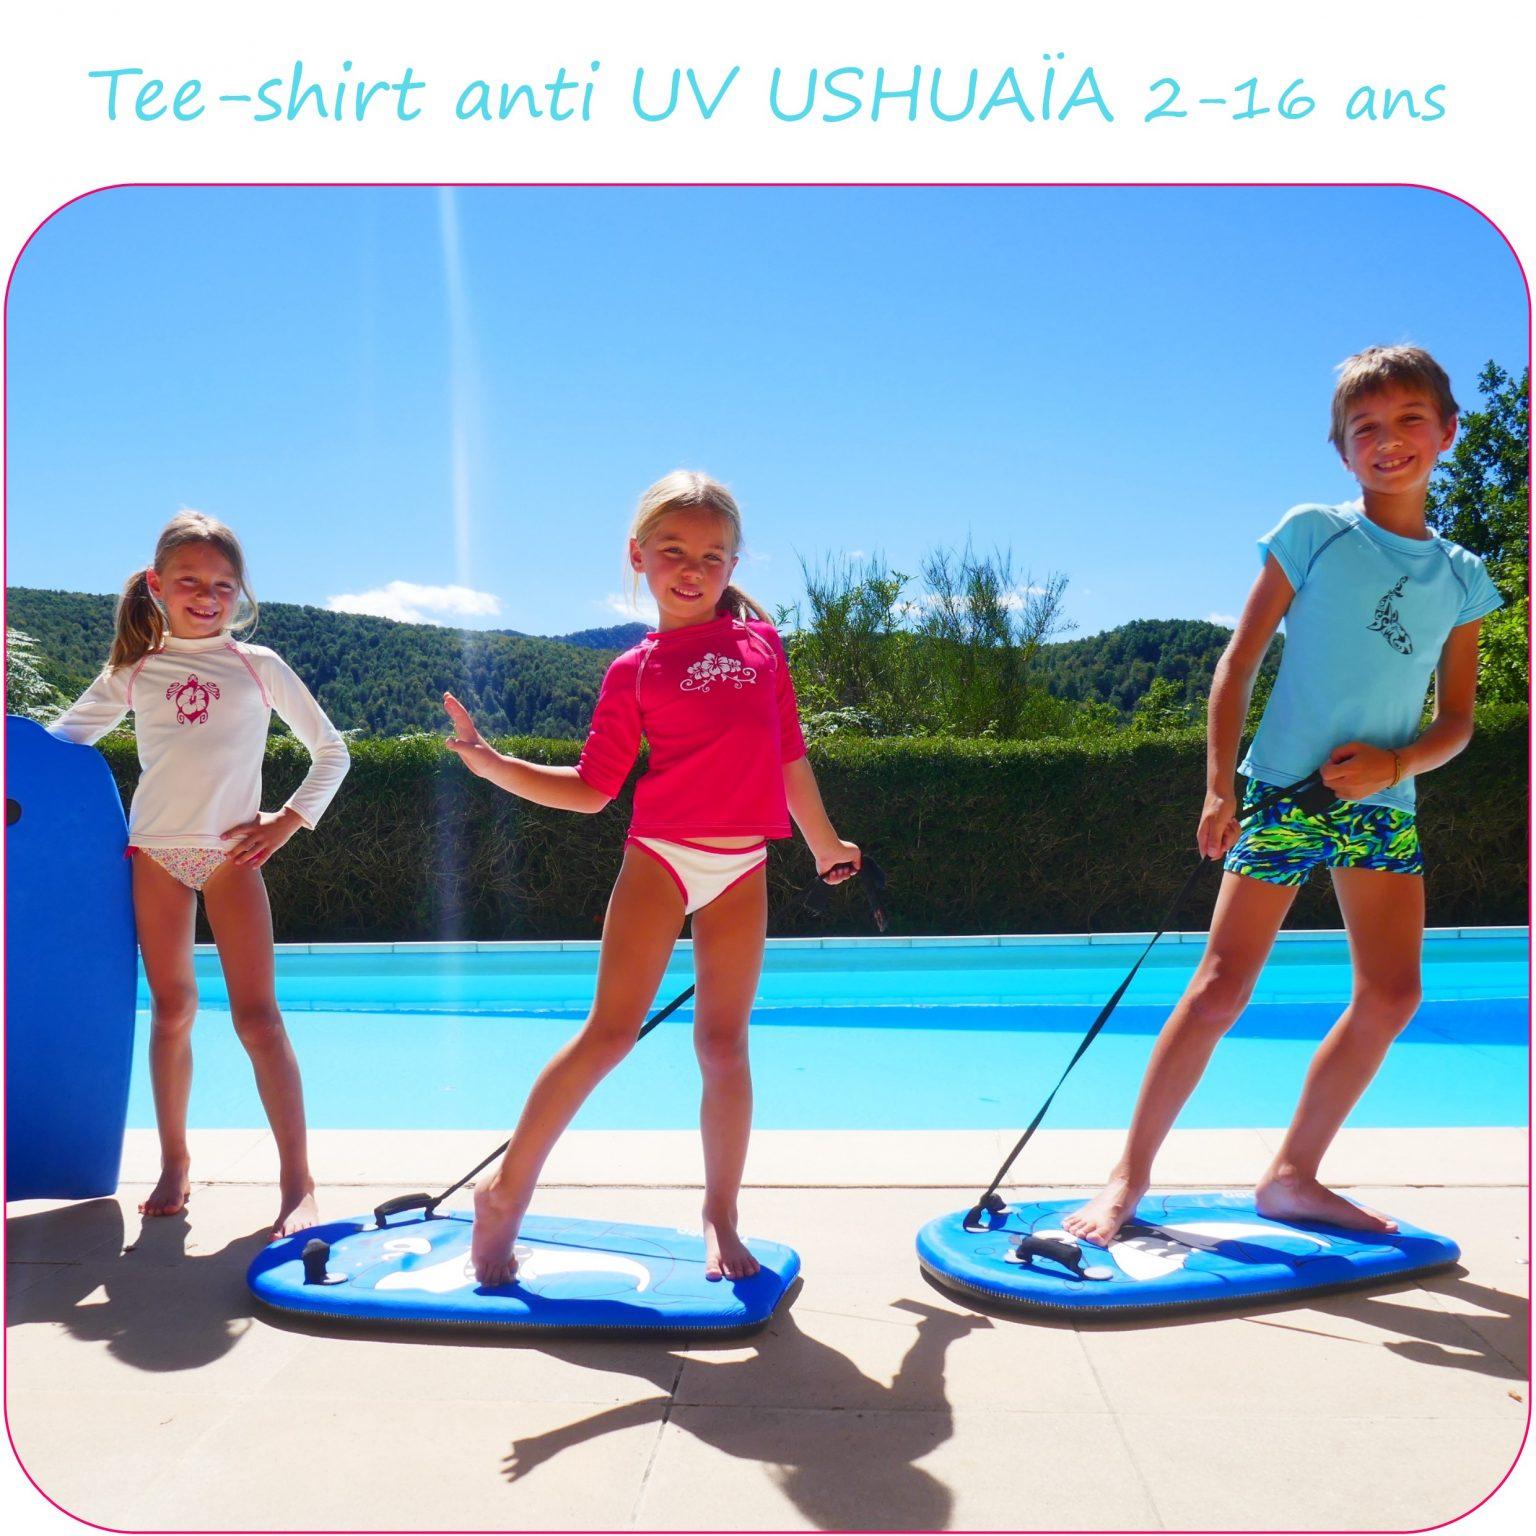 USHUAIA-PresentationSite_PetitsDom